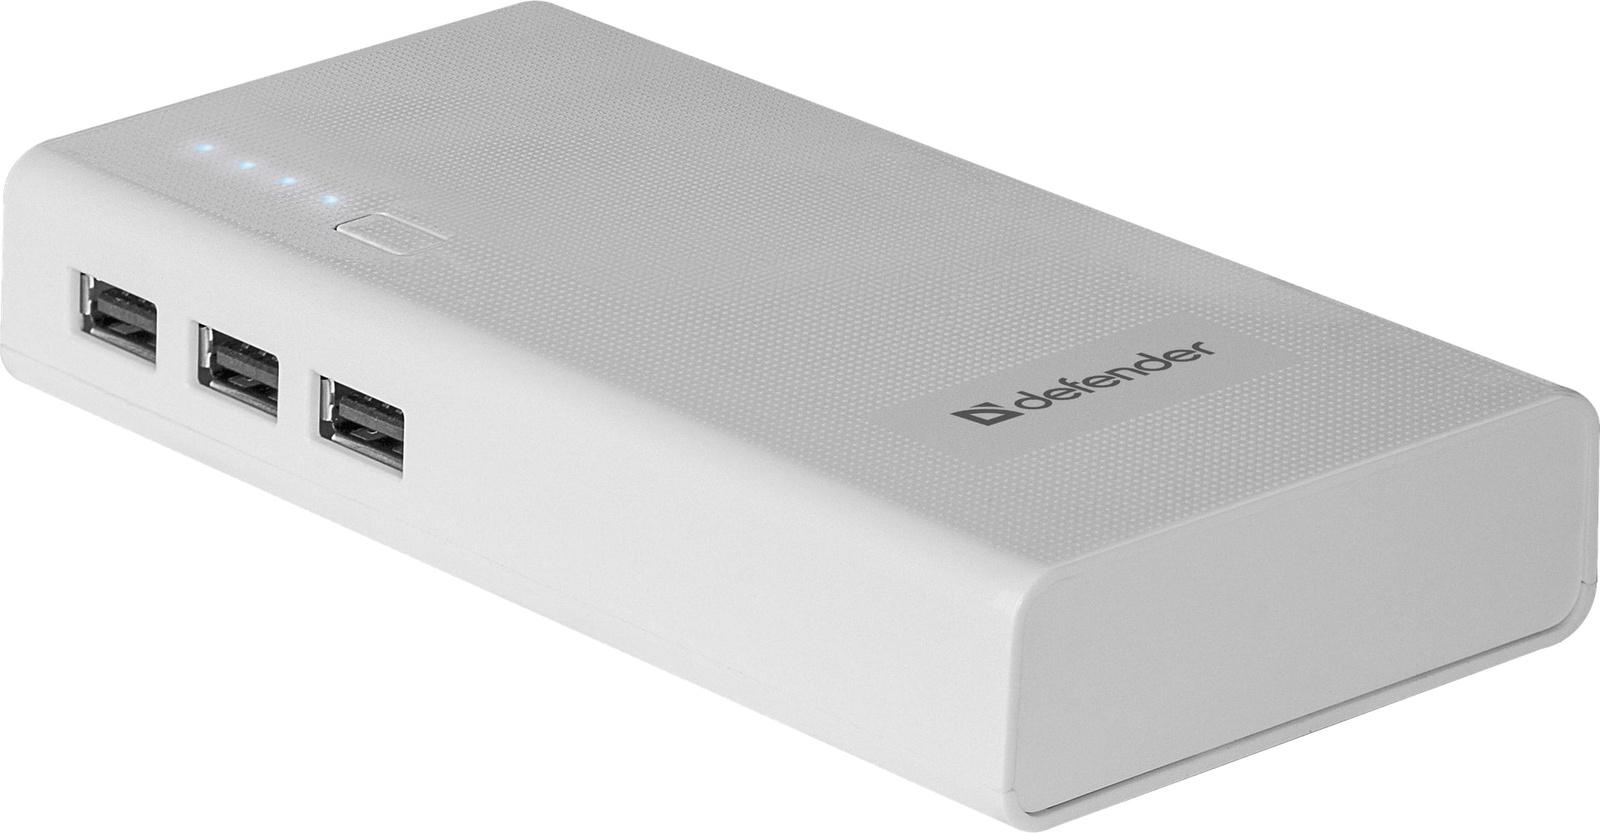 Внешний аккумулятор Defender Lavita 10000E 3 USB 10000 mAh 2.1A цена